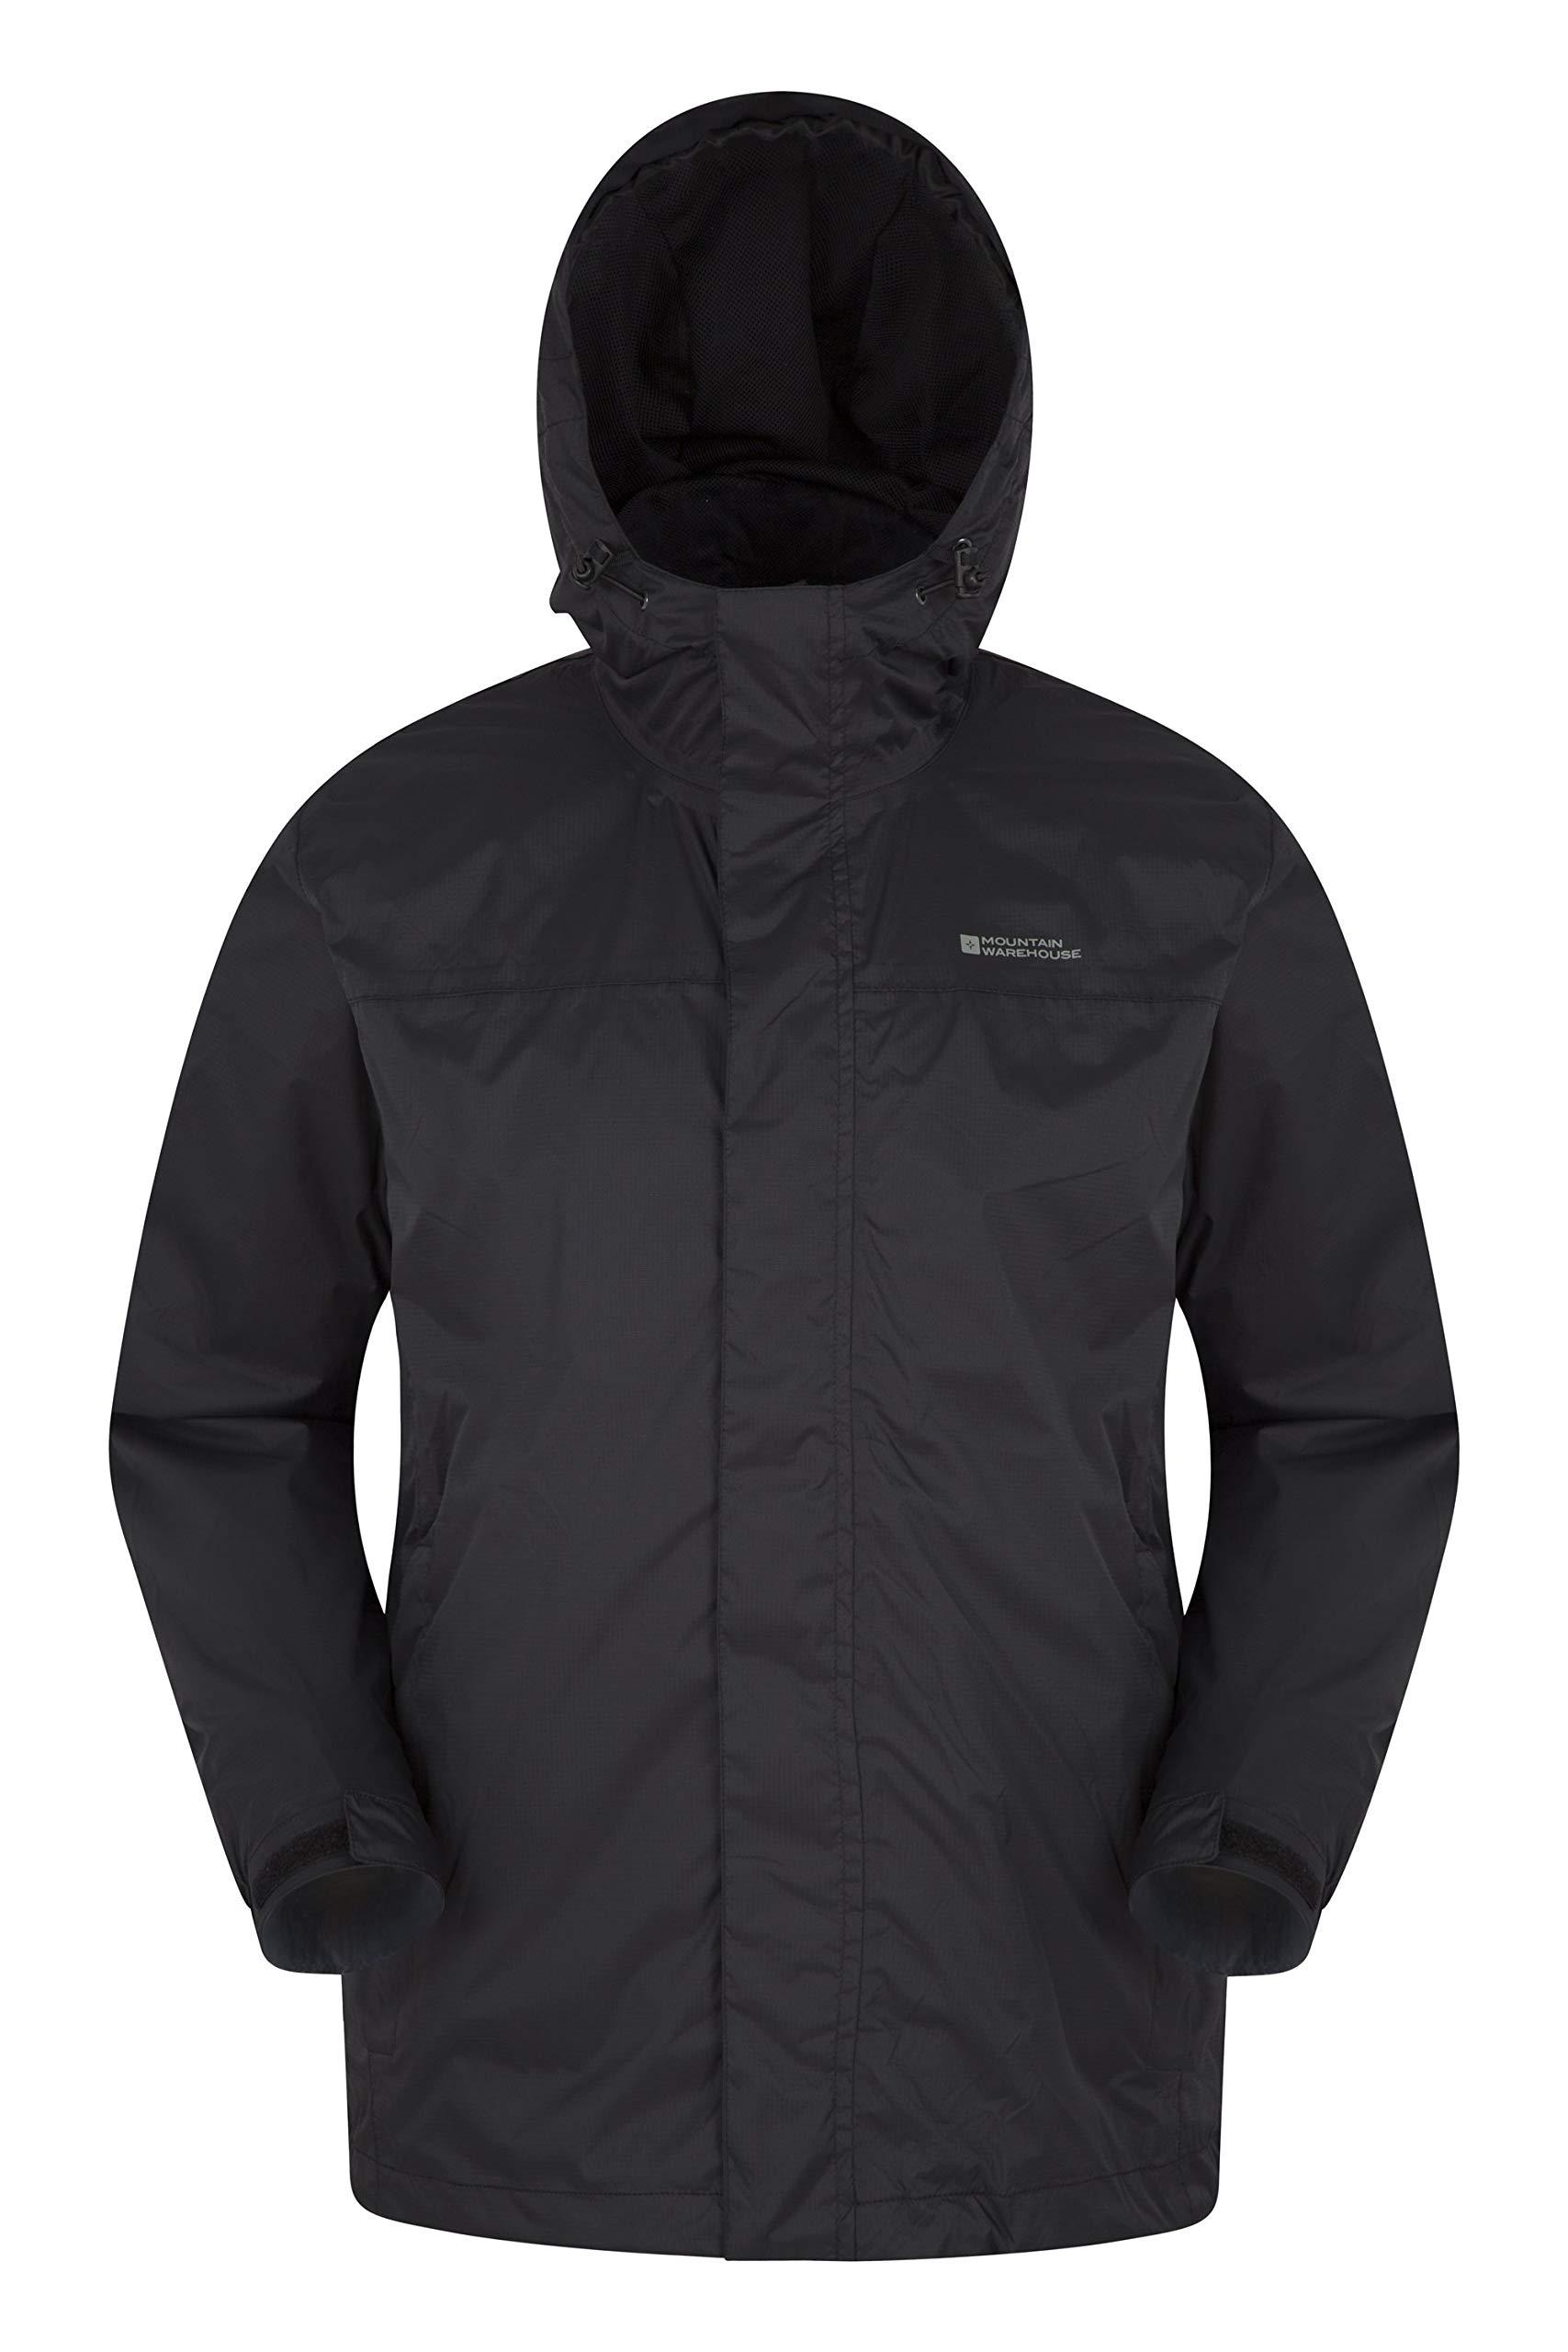 Taped Seams Mountain Warehouse 3 In 1 Mens Waterproof Rain Jacket